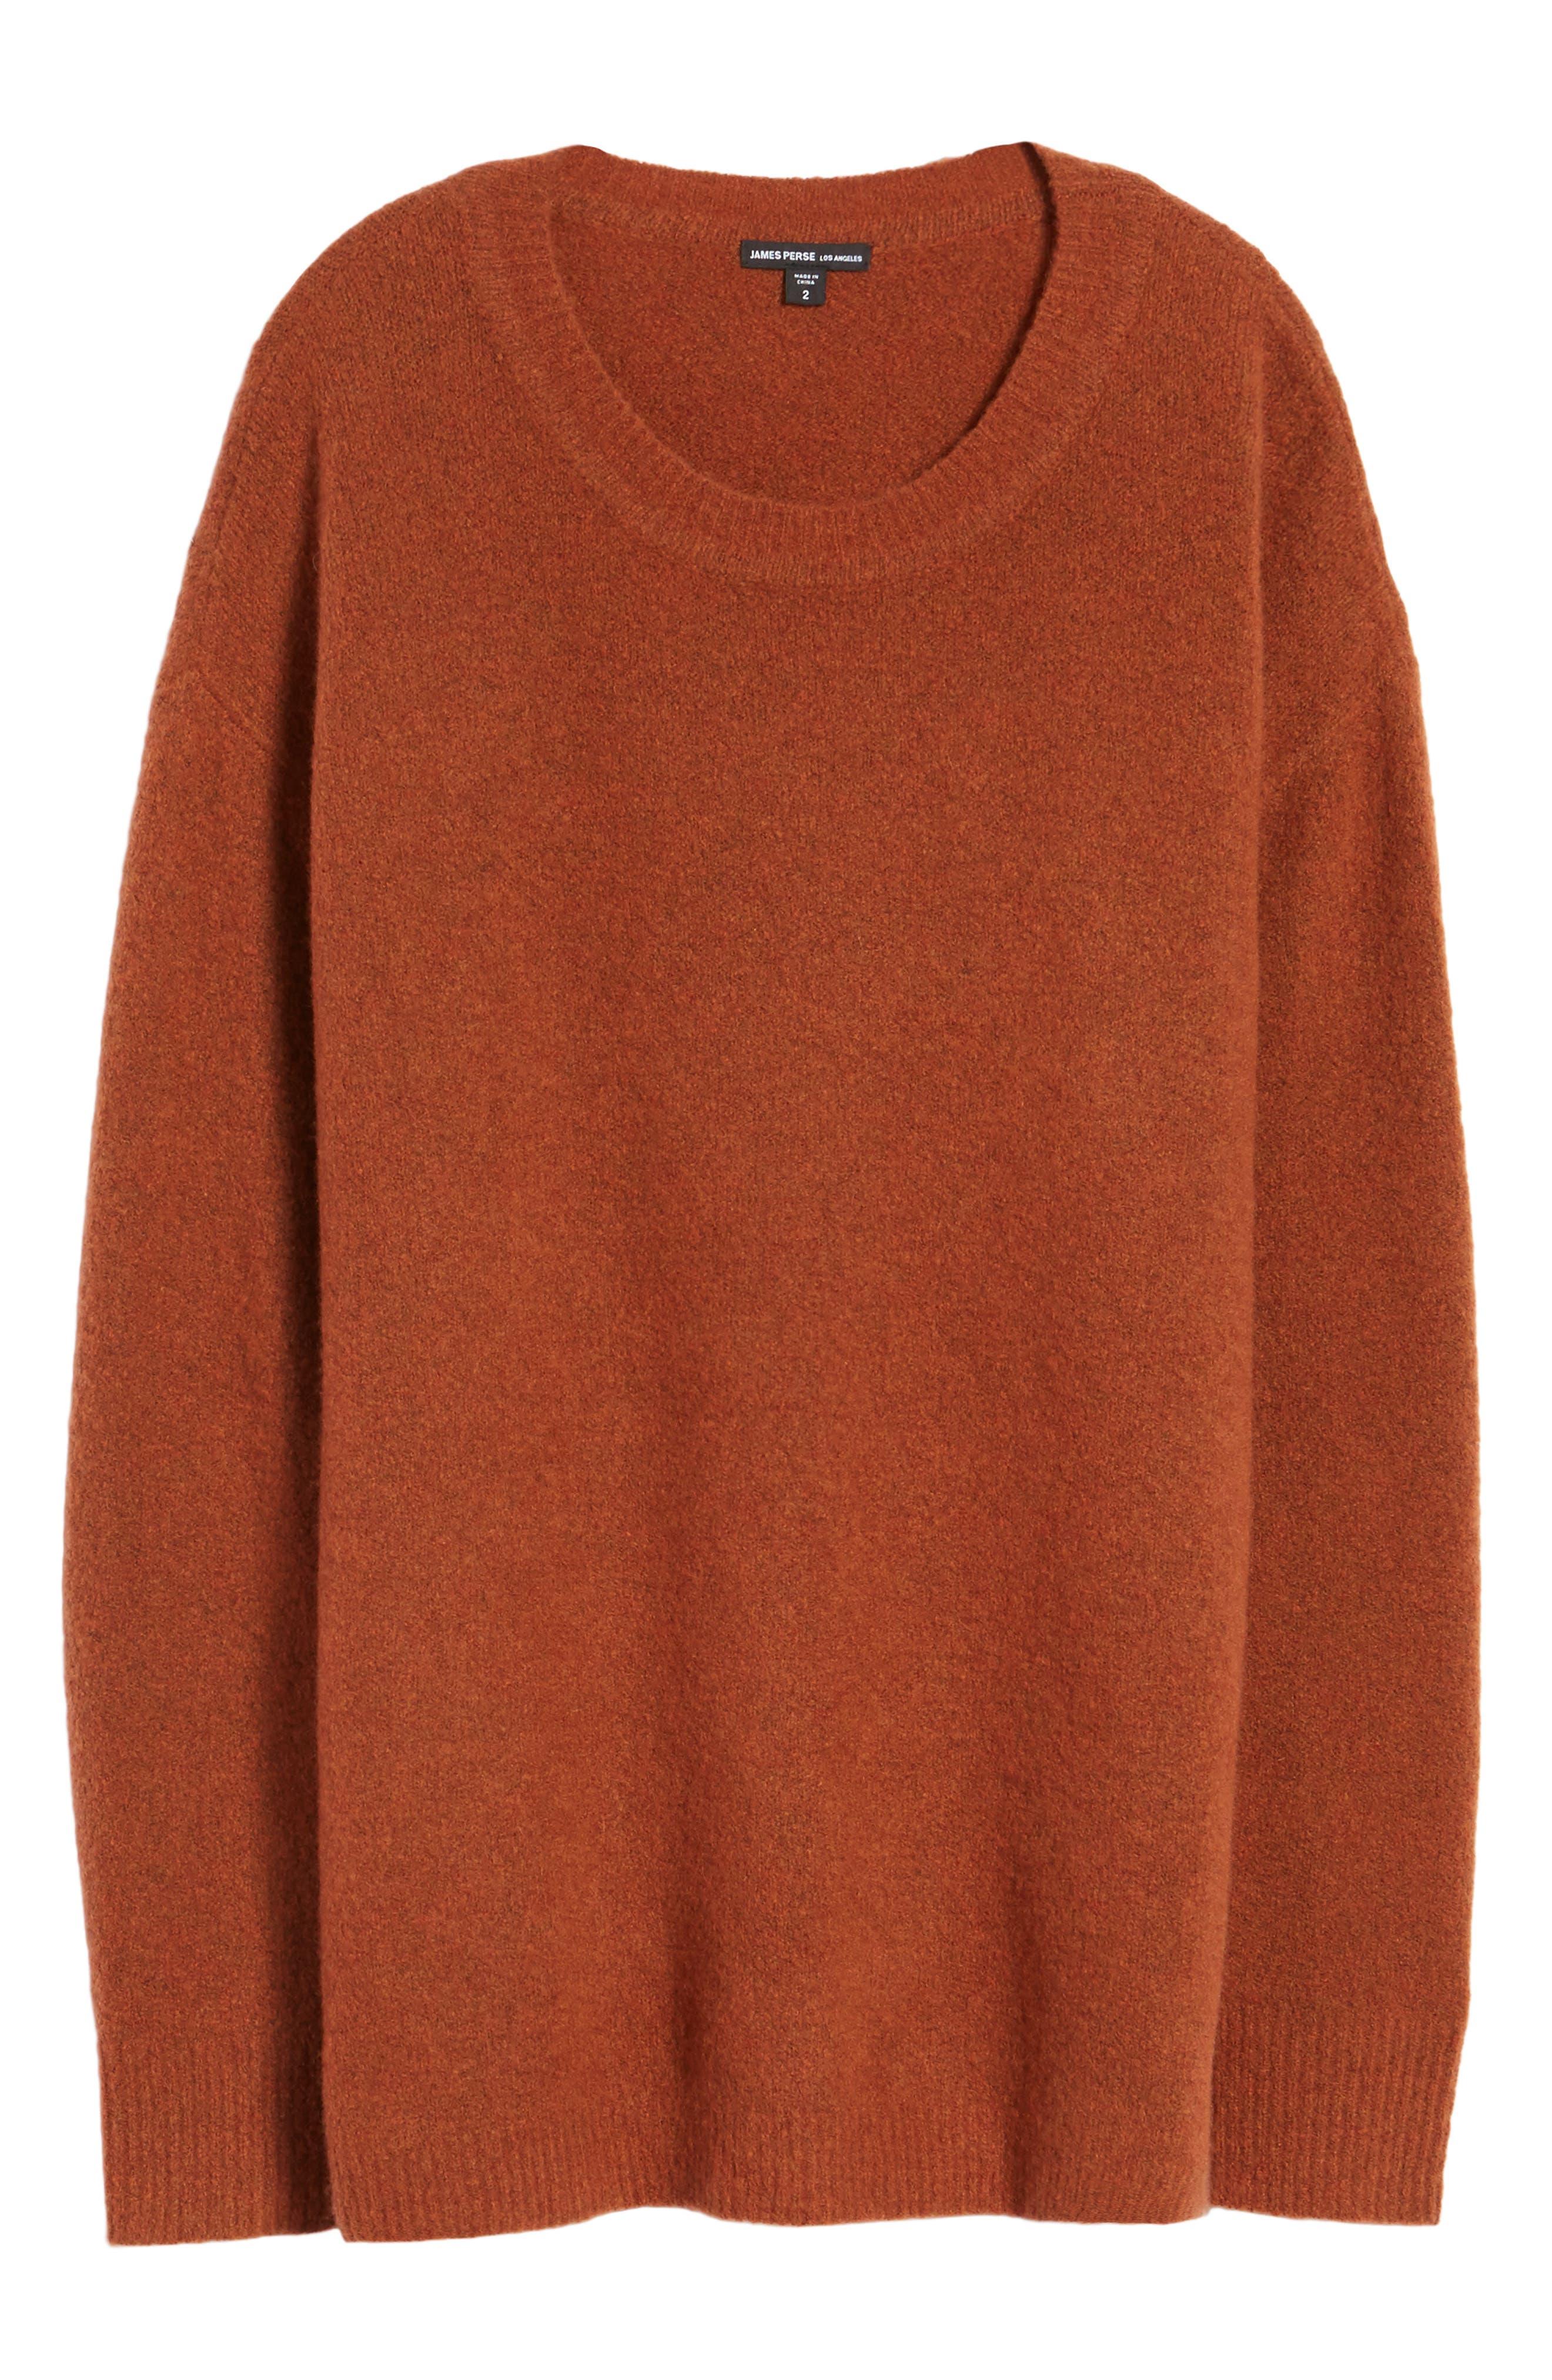 Oversize Cashmere Sweater,                             Alternate thumbnail 6, color,                             806